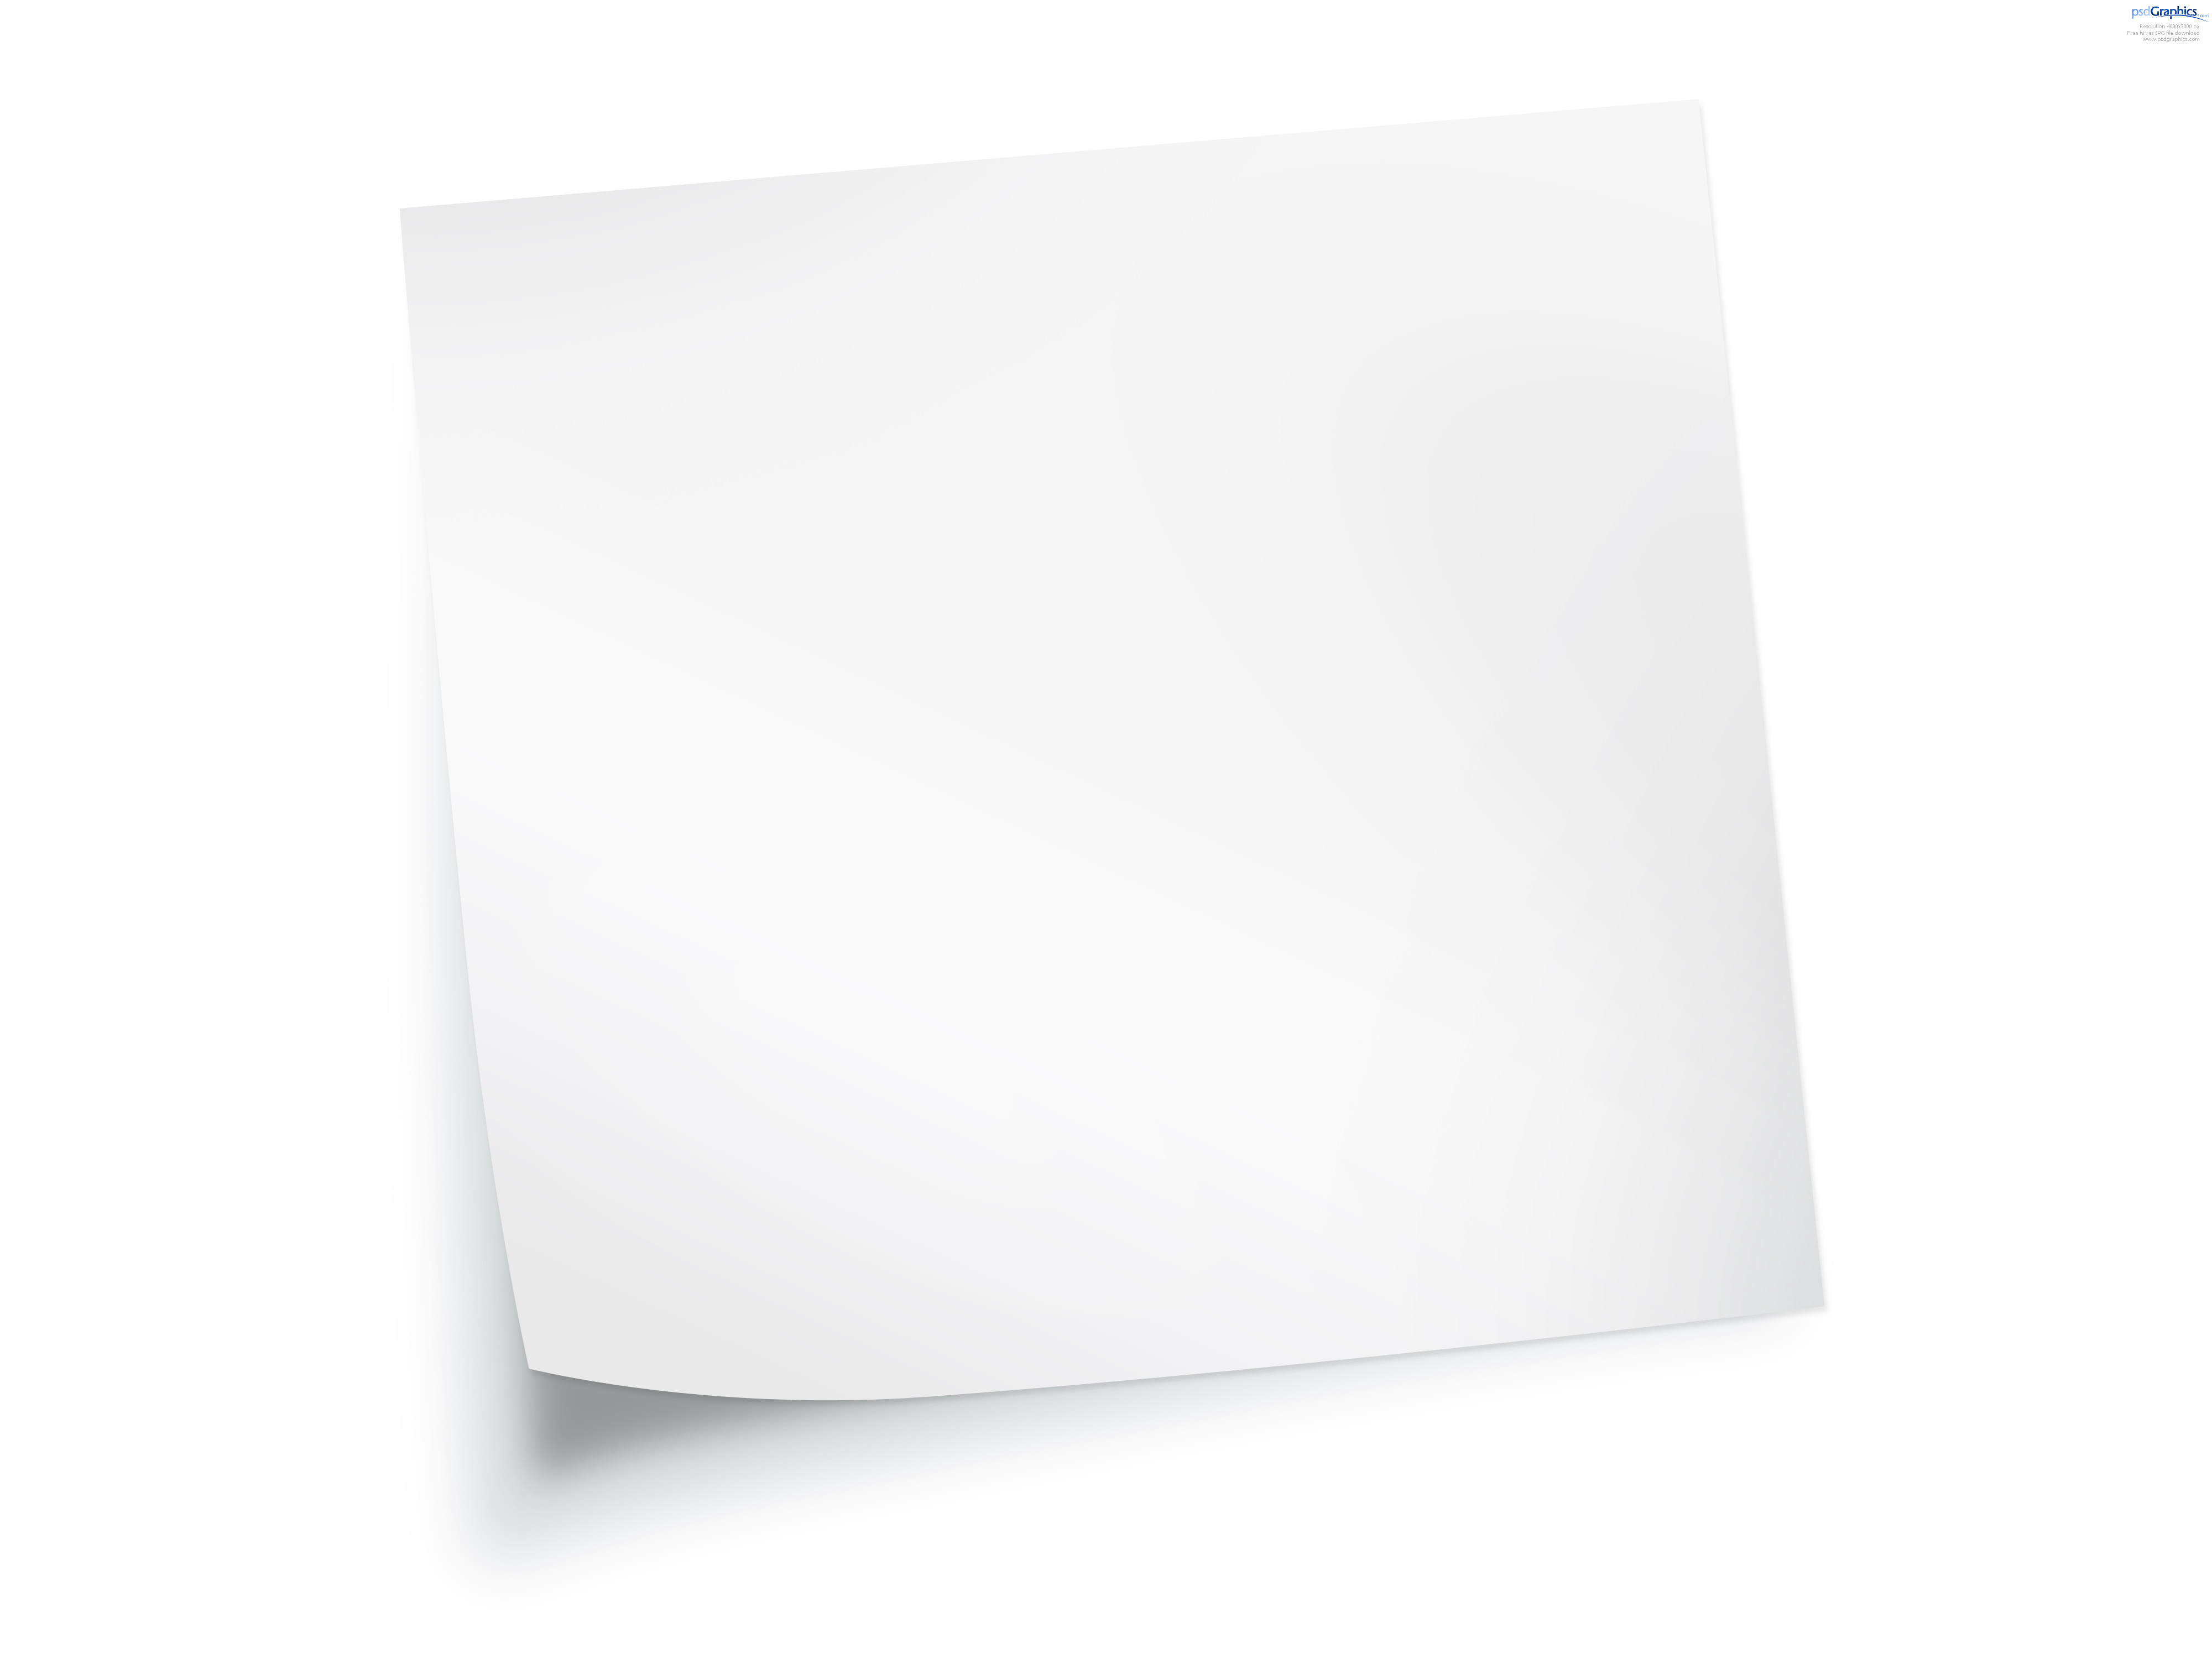 Sticky notes | PSDGraphics